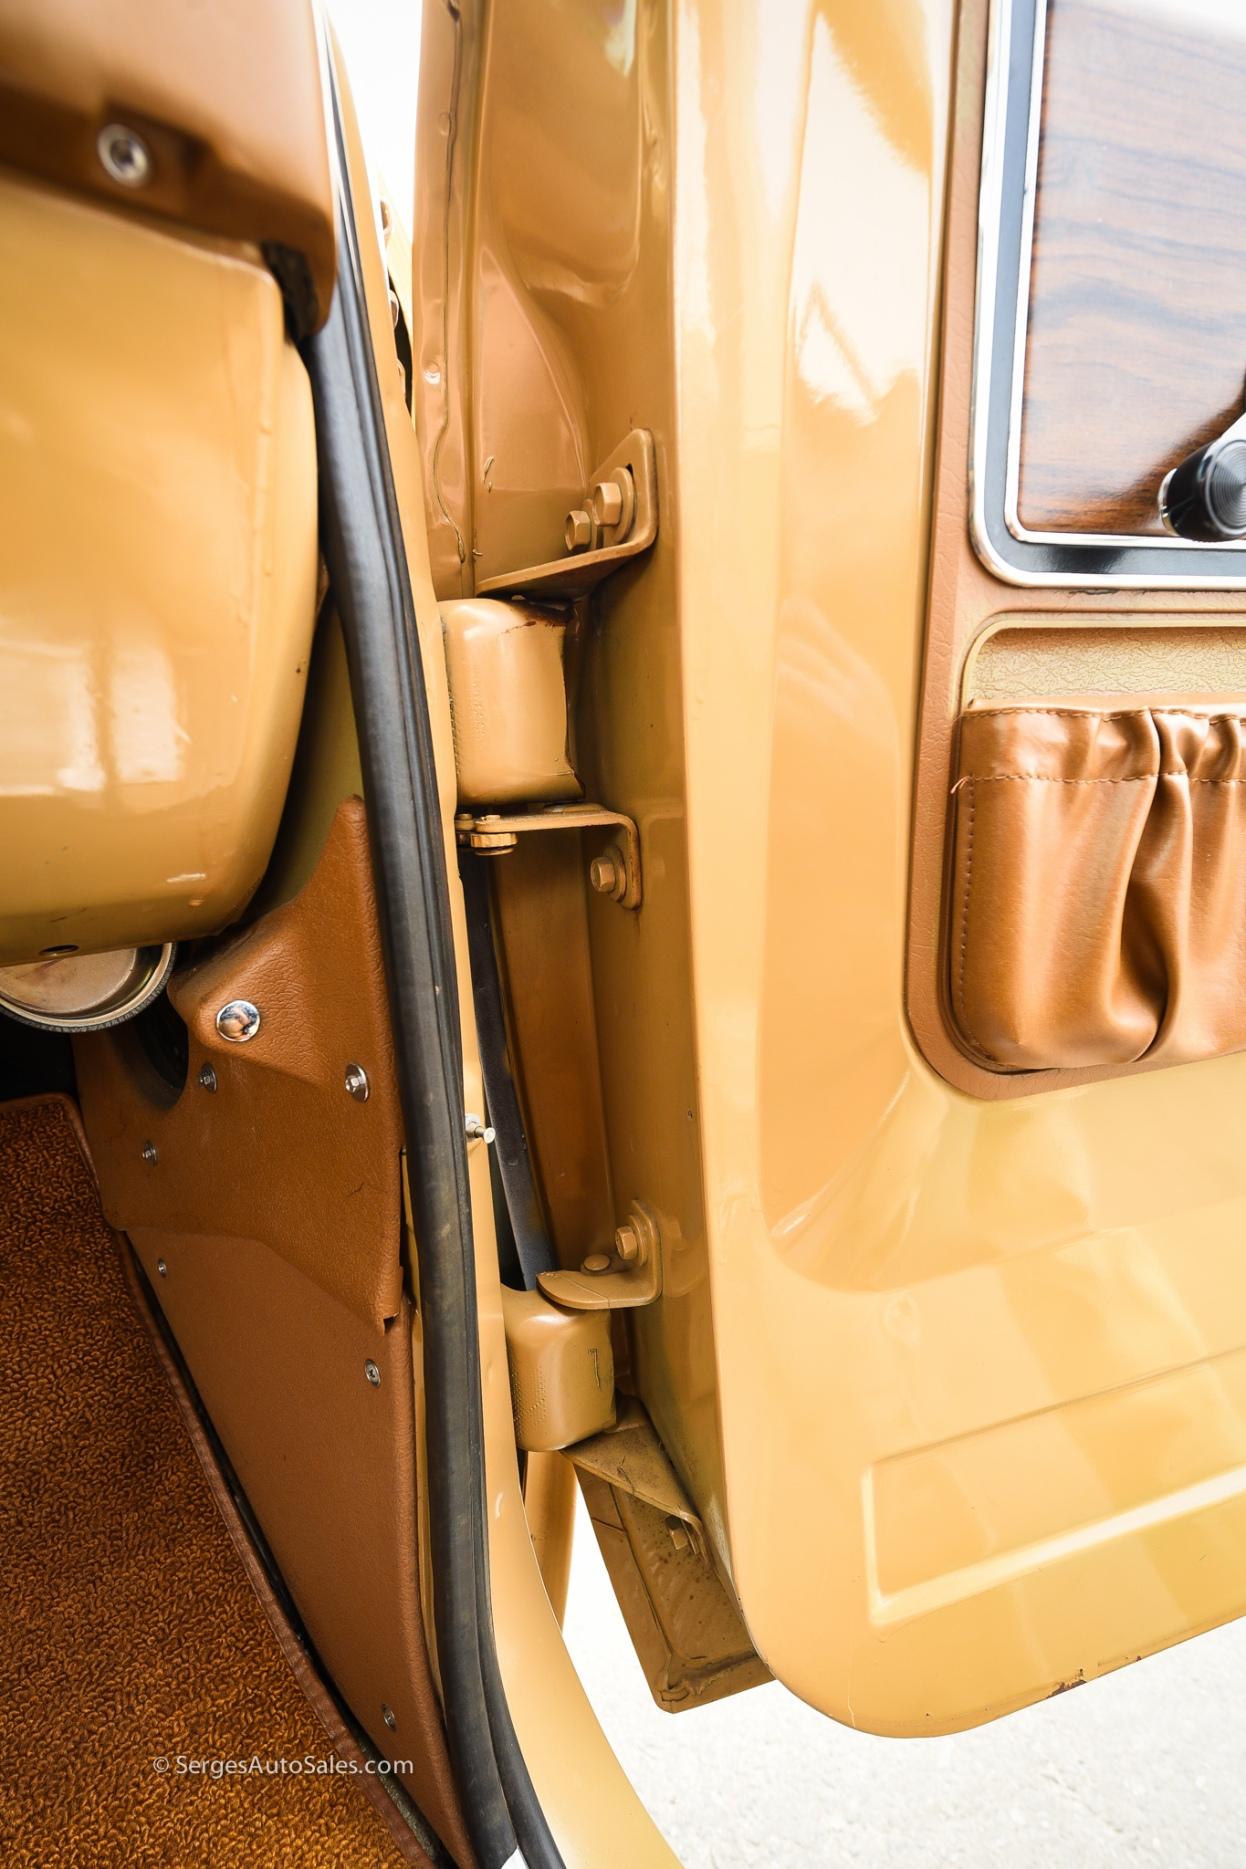 1973-1972-1971-1970-1969-chevrolet-cheyenne-pick-up-for-sale-barrett-mecum-serges-auto-sales-scranton-blakely-pennsylvania-92